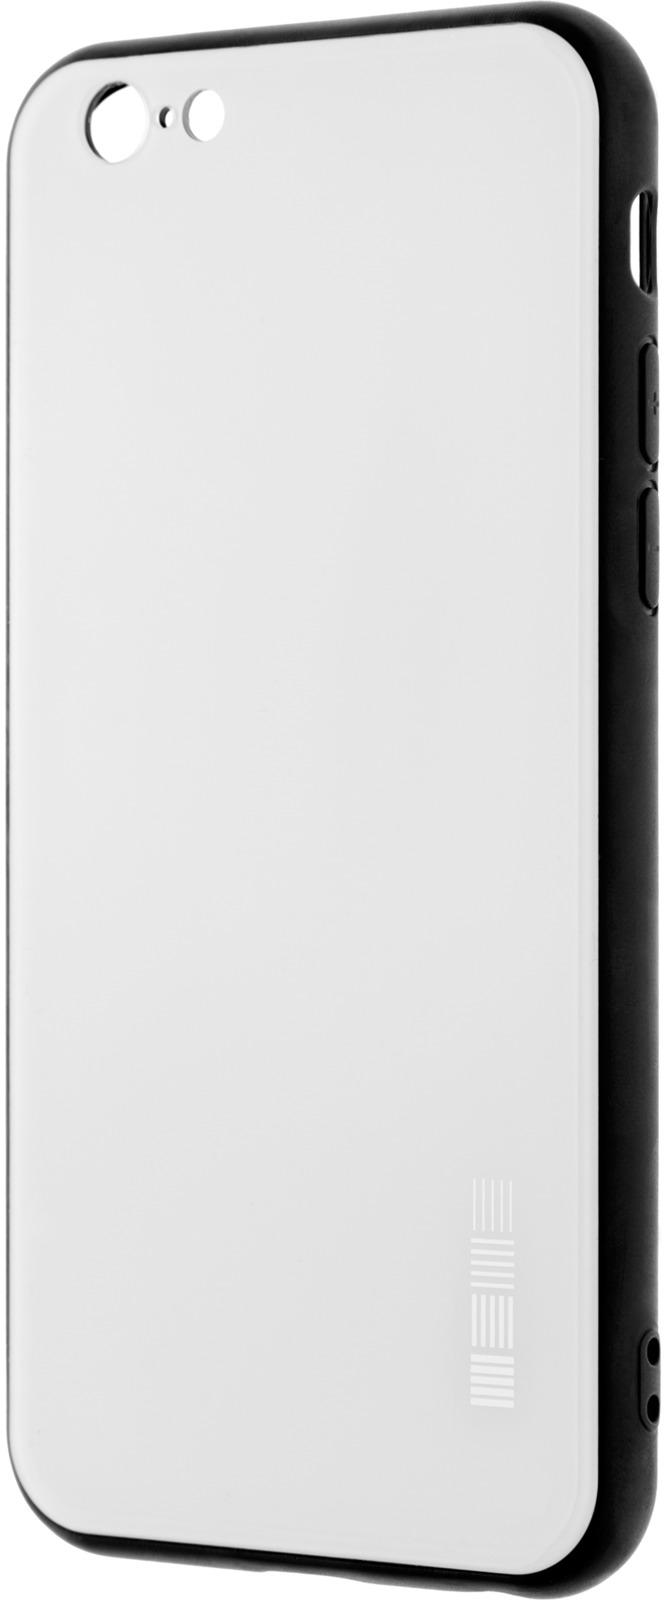 Чехол-накладка Interstep Is Glass для Apple iPhone 6/6S, White чехол накладка interstep is glass для apple iphone x red